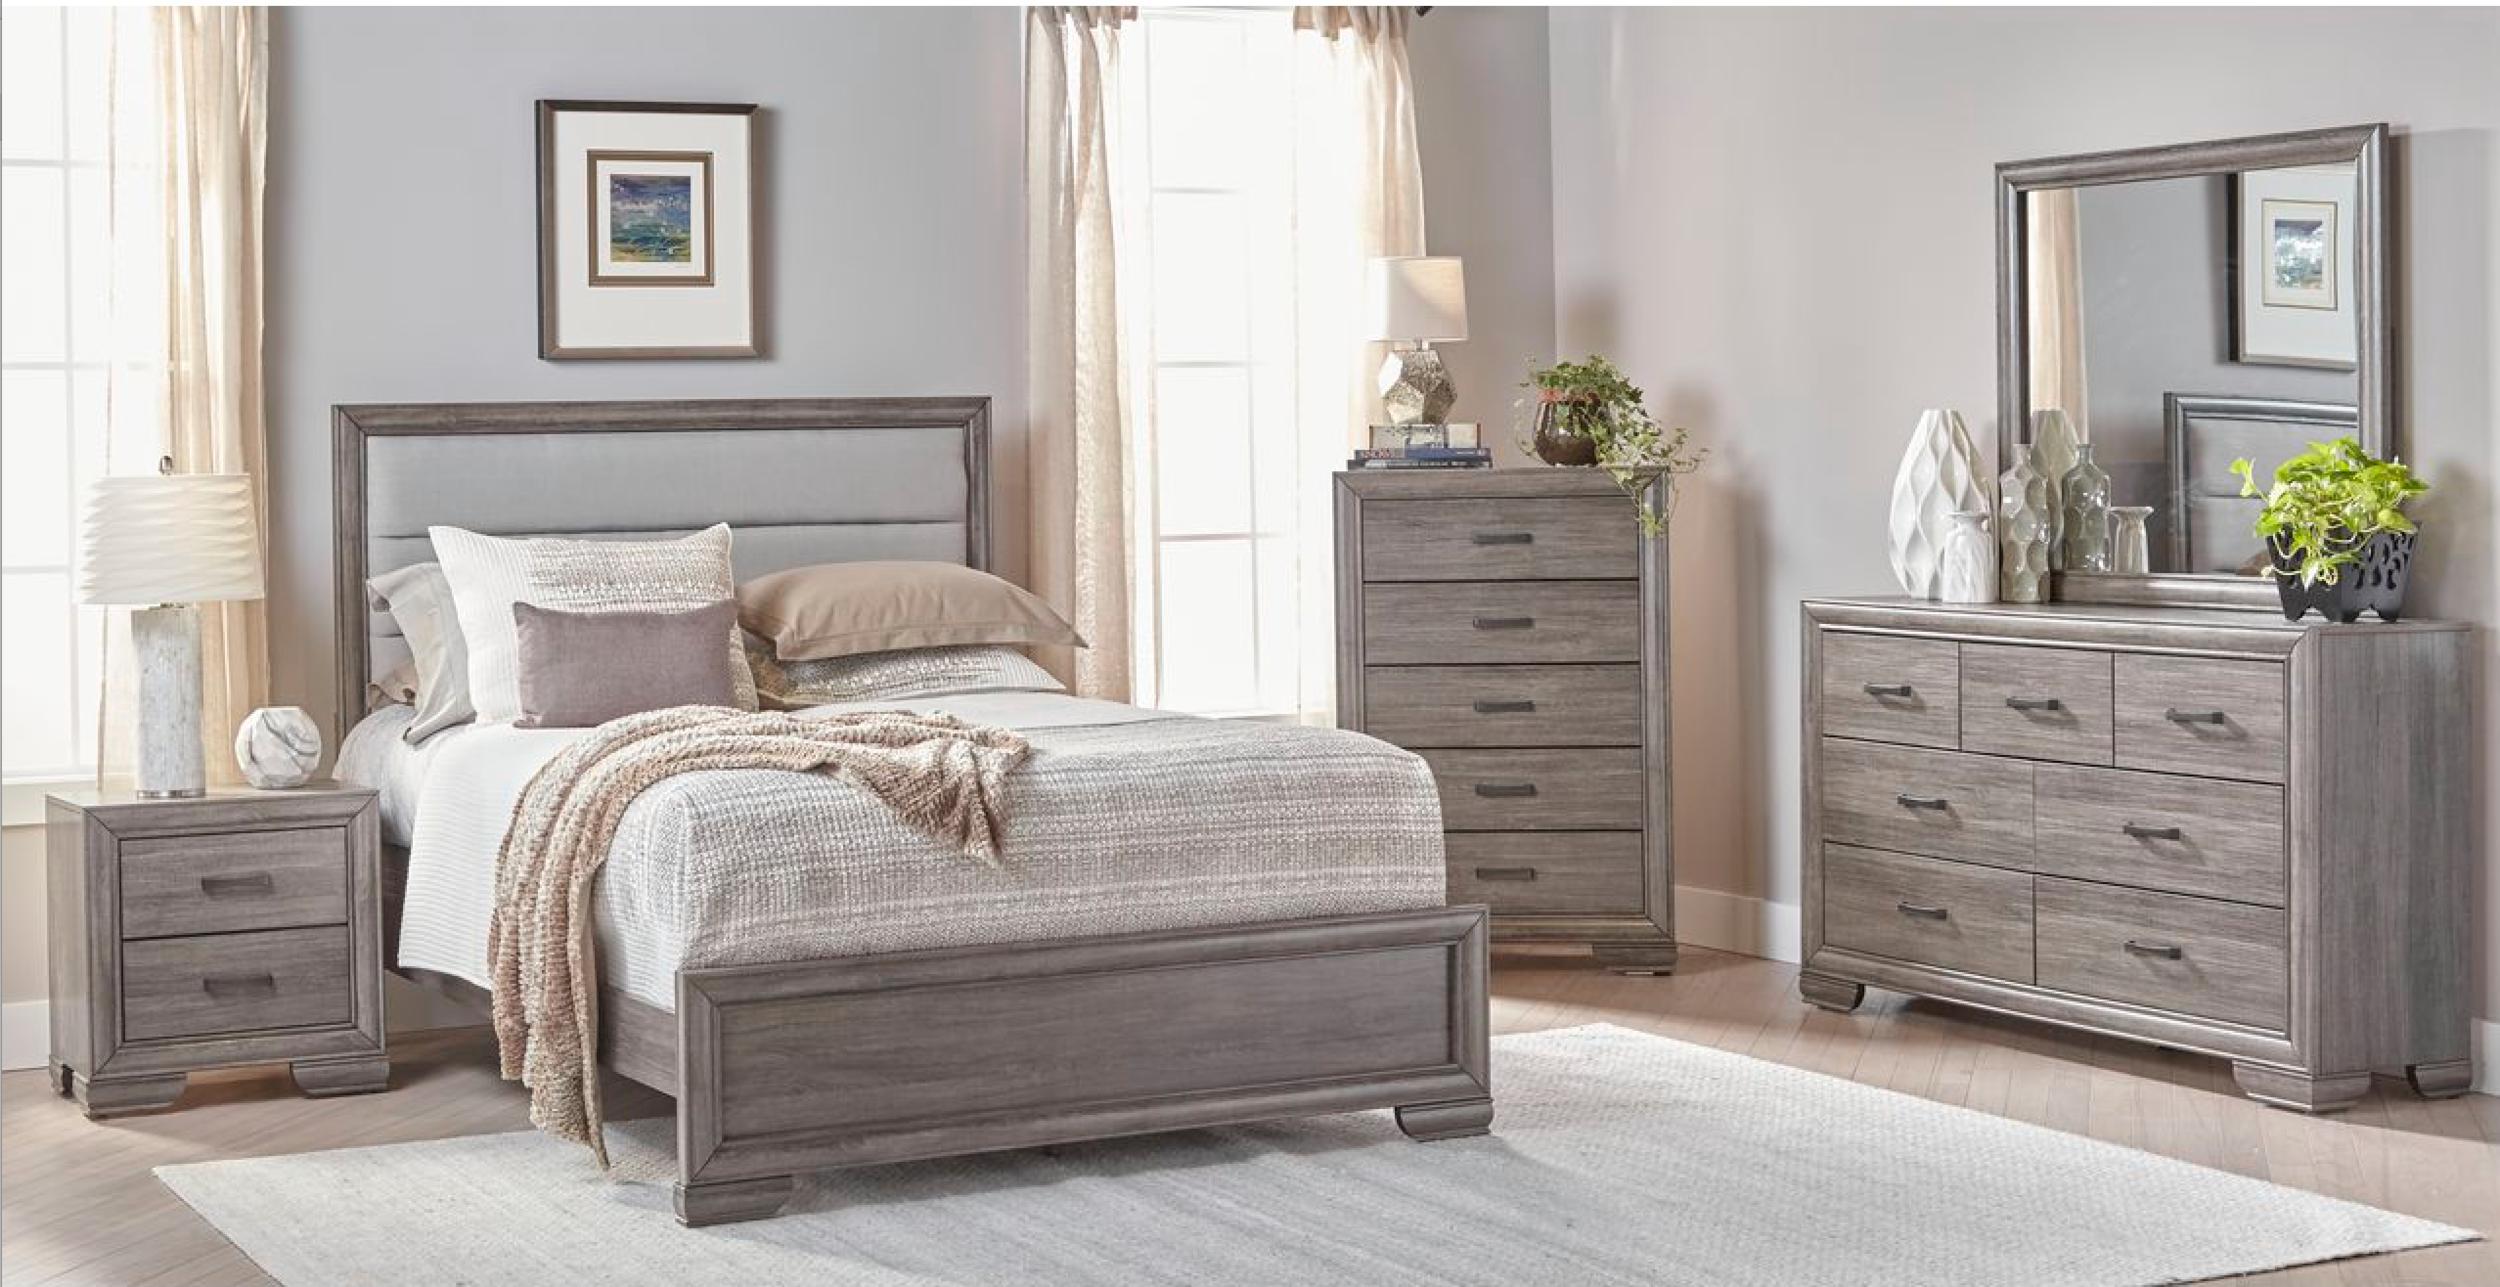 discount furniture. Urban_grey_bedroom_set_C6412_discount_furniture_warehouse_honoluu_hawaii_oahu.png Discount Furniture